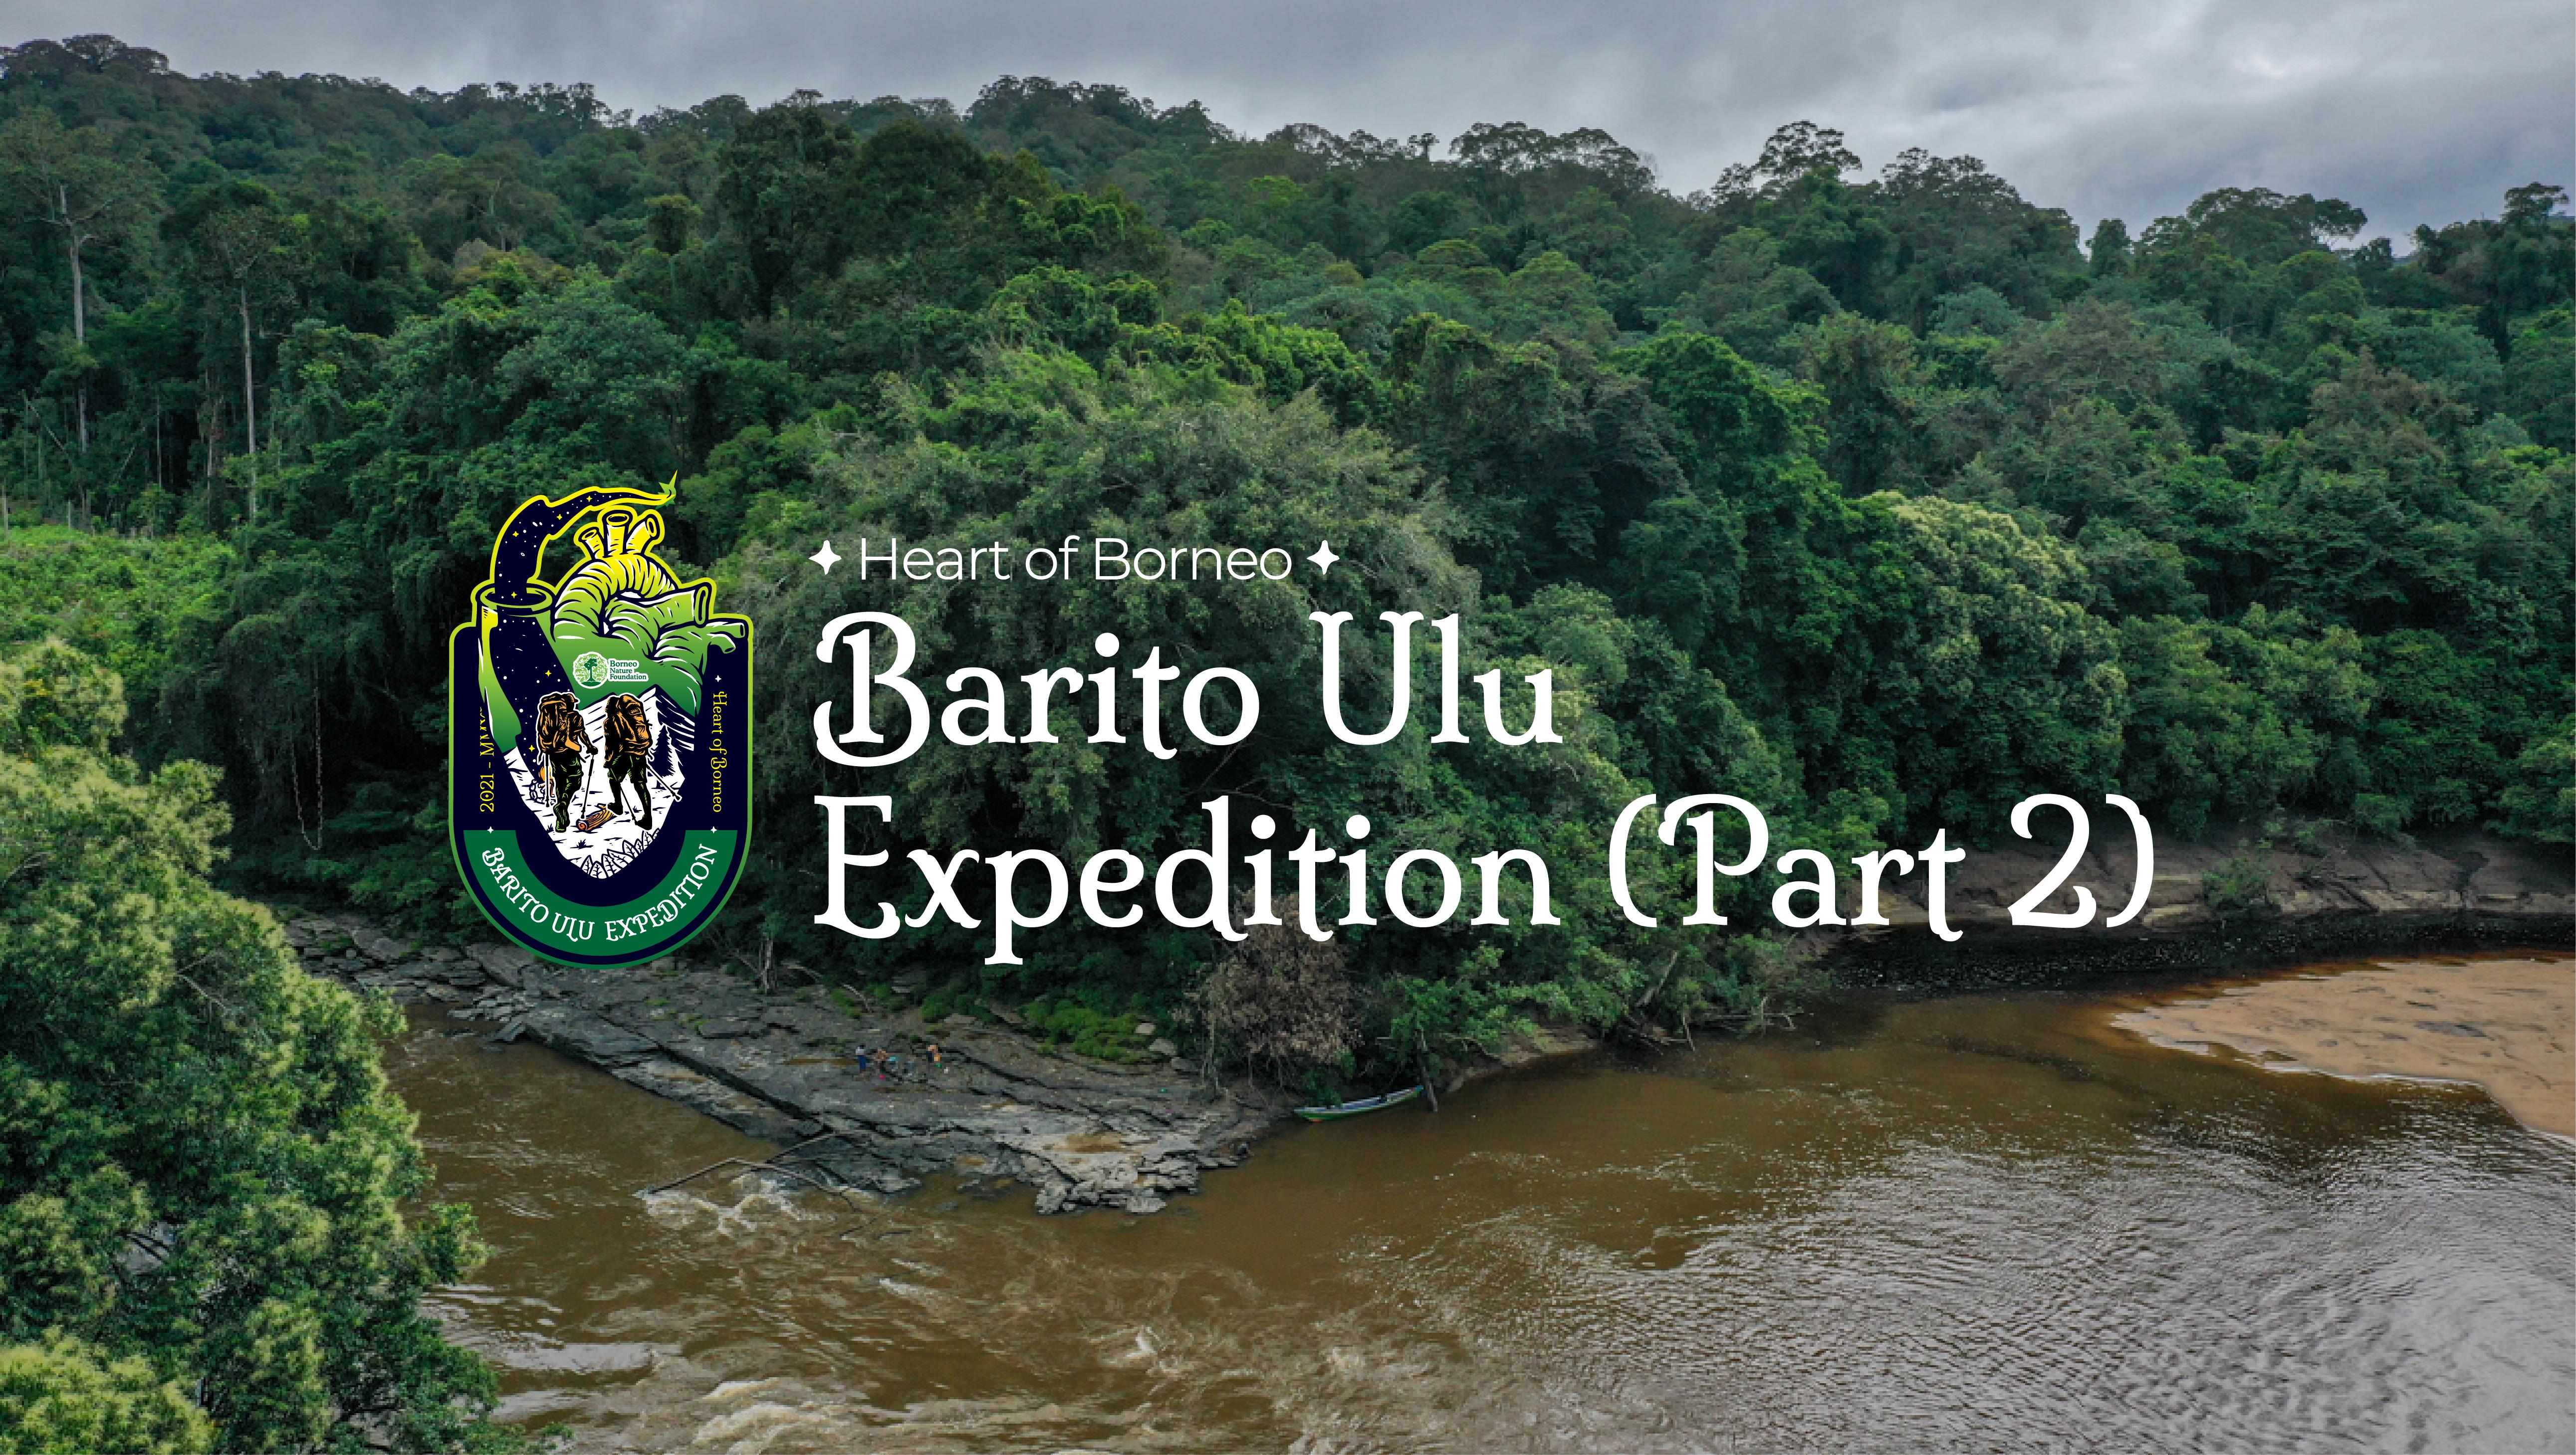 210707 - Barito Ulu Expedition - web banner-02 - Copy